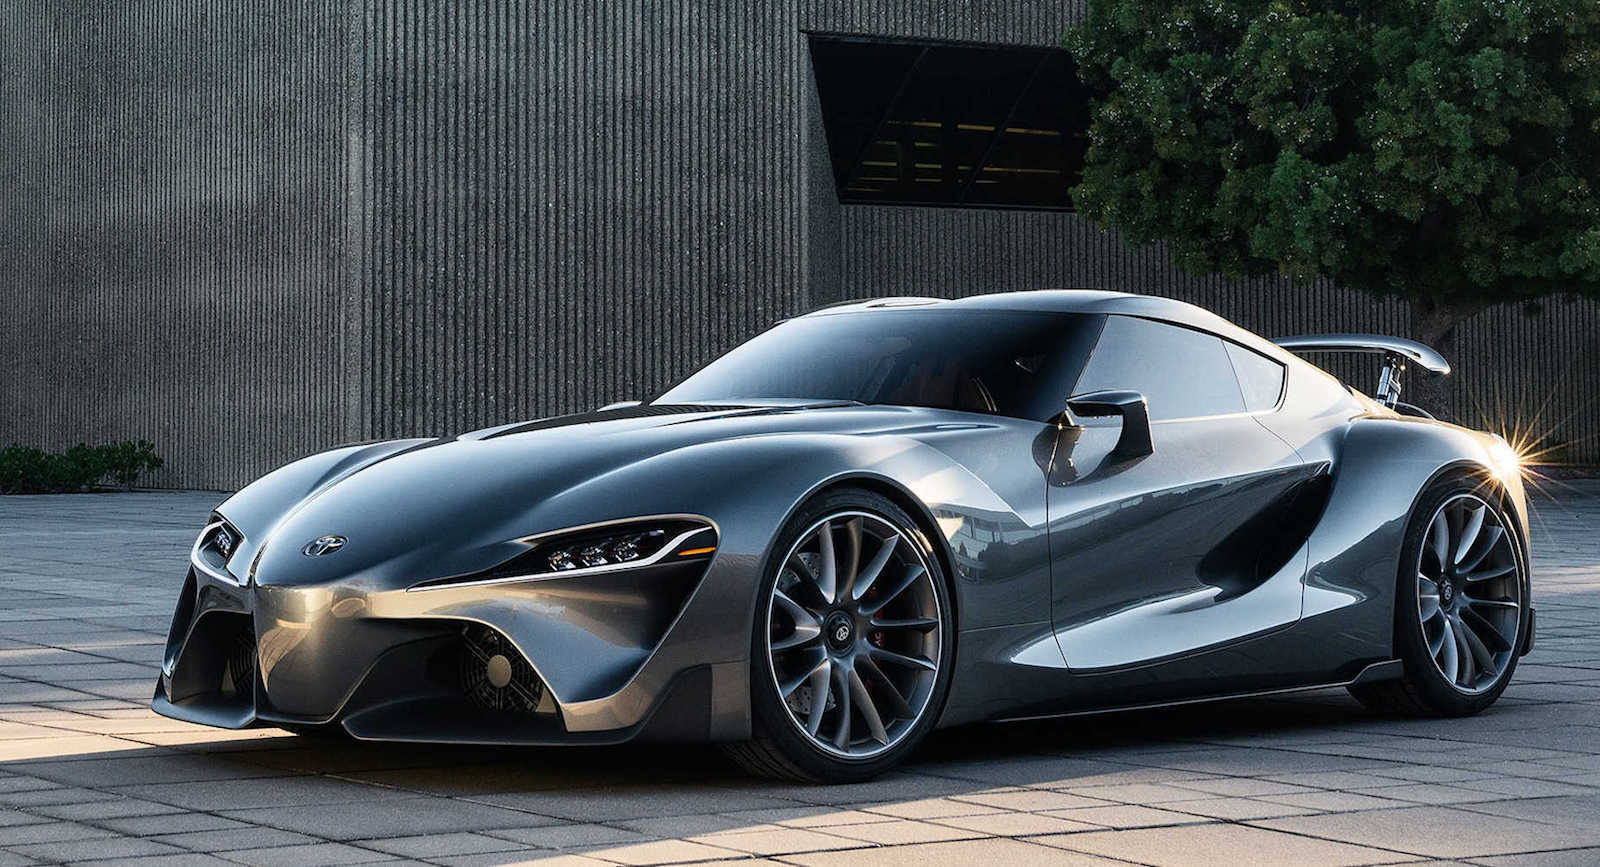 Toyota-Supra-Renderings-6-1